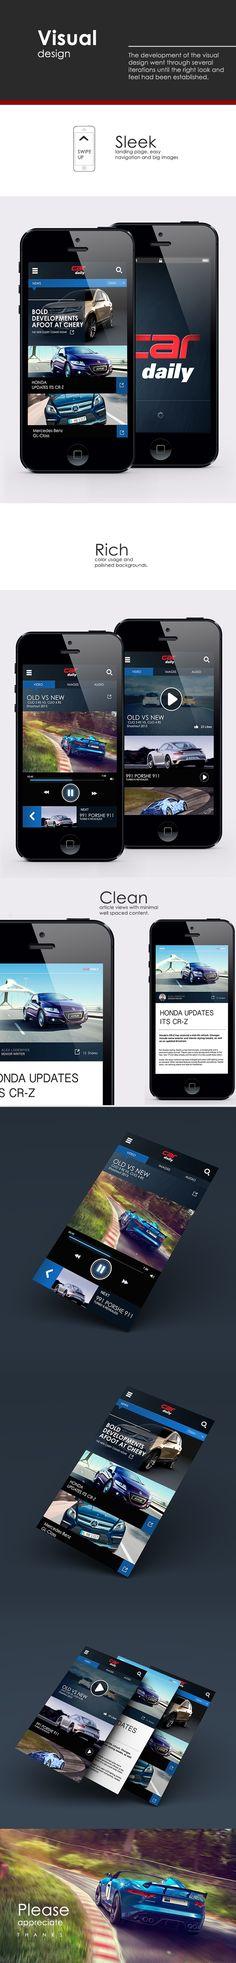 Car Daily app design by Calvin Pedzai, via Behance